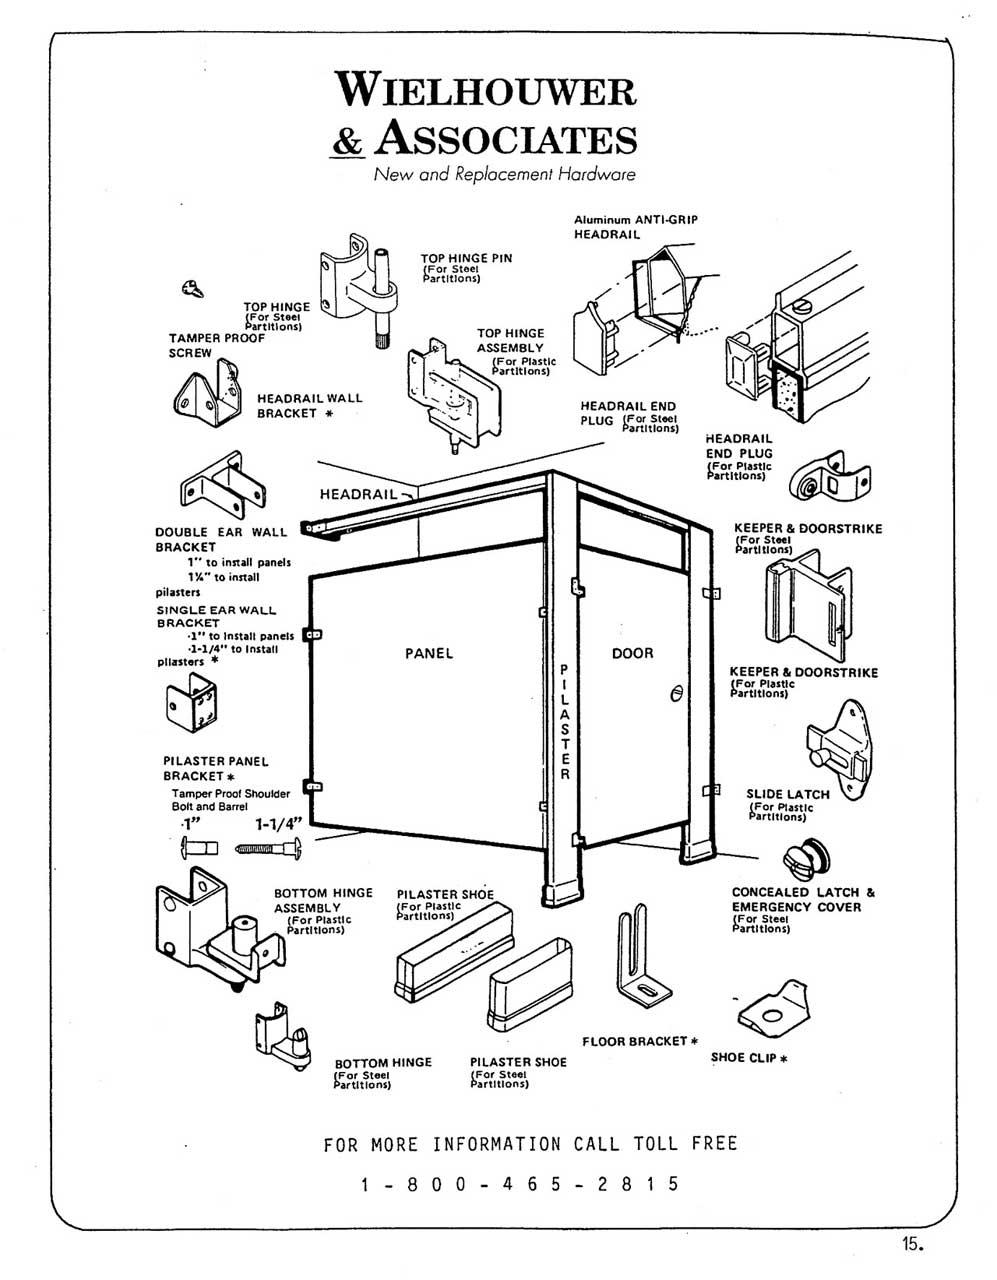 Door Closer Parts & Falcon SC60 Commercial Door Closer